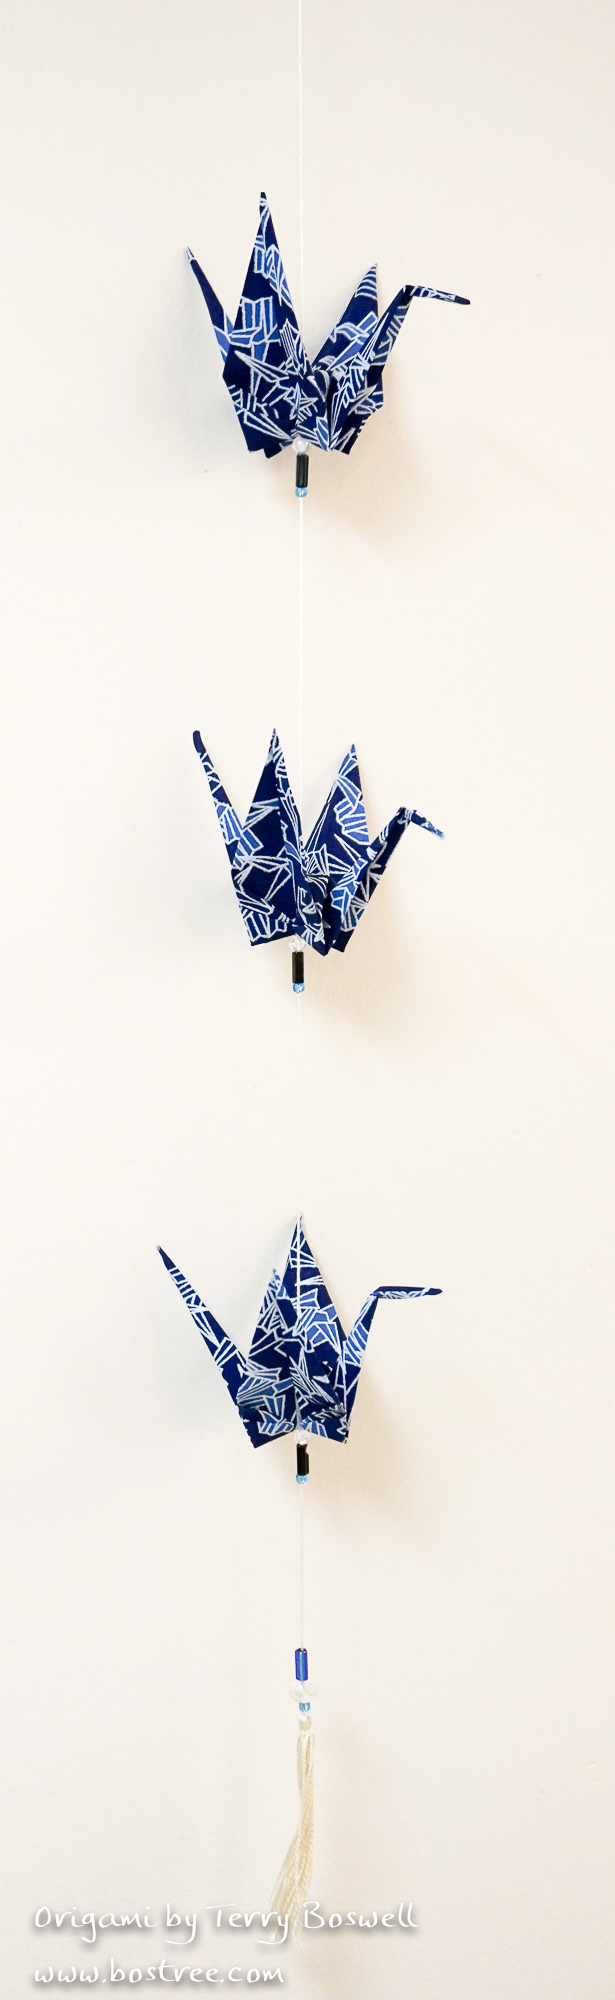 Three Crane Origami Mobile - Dark Blue, Light Blue, White